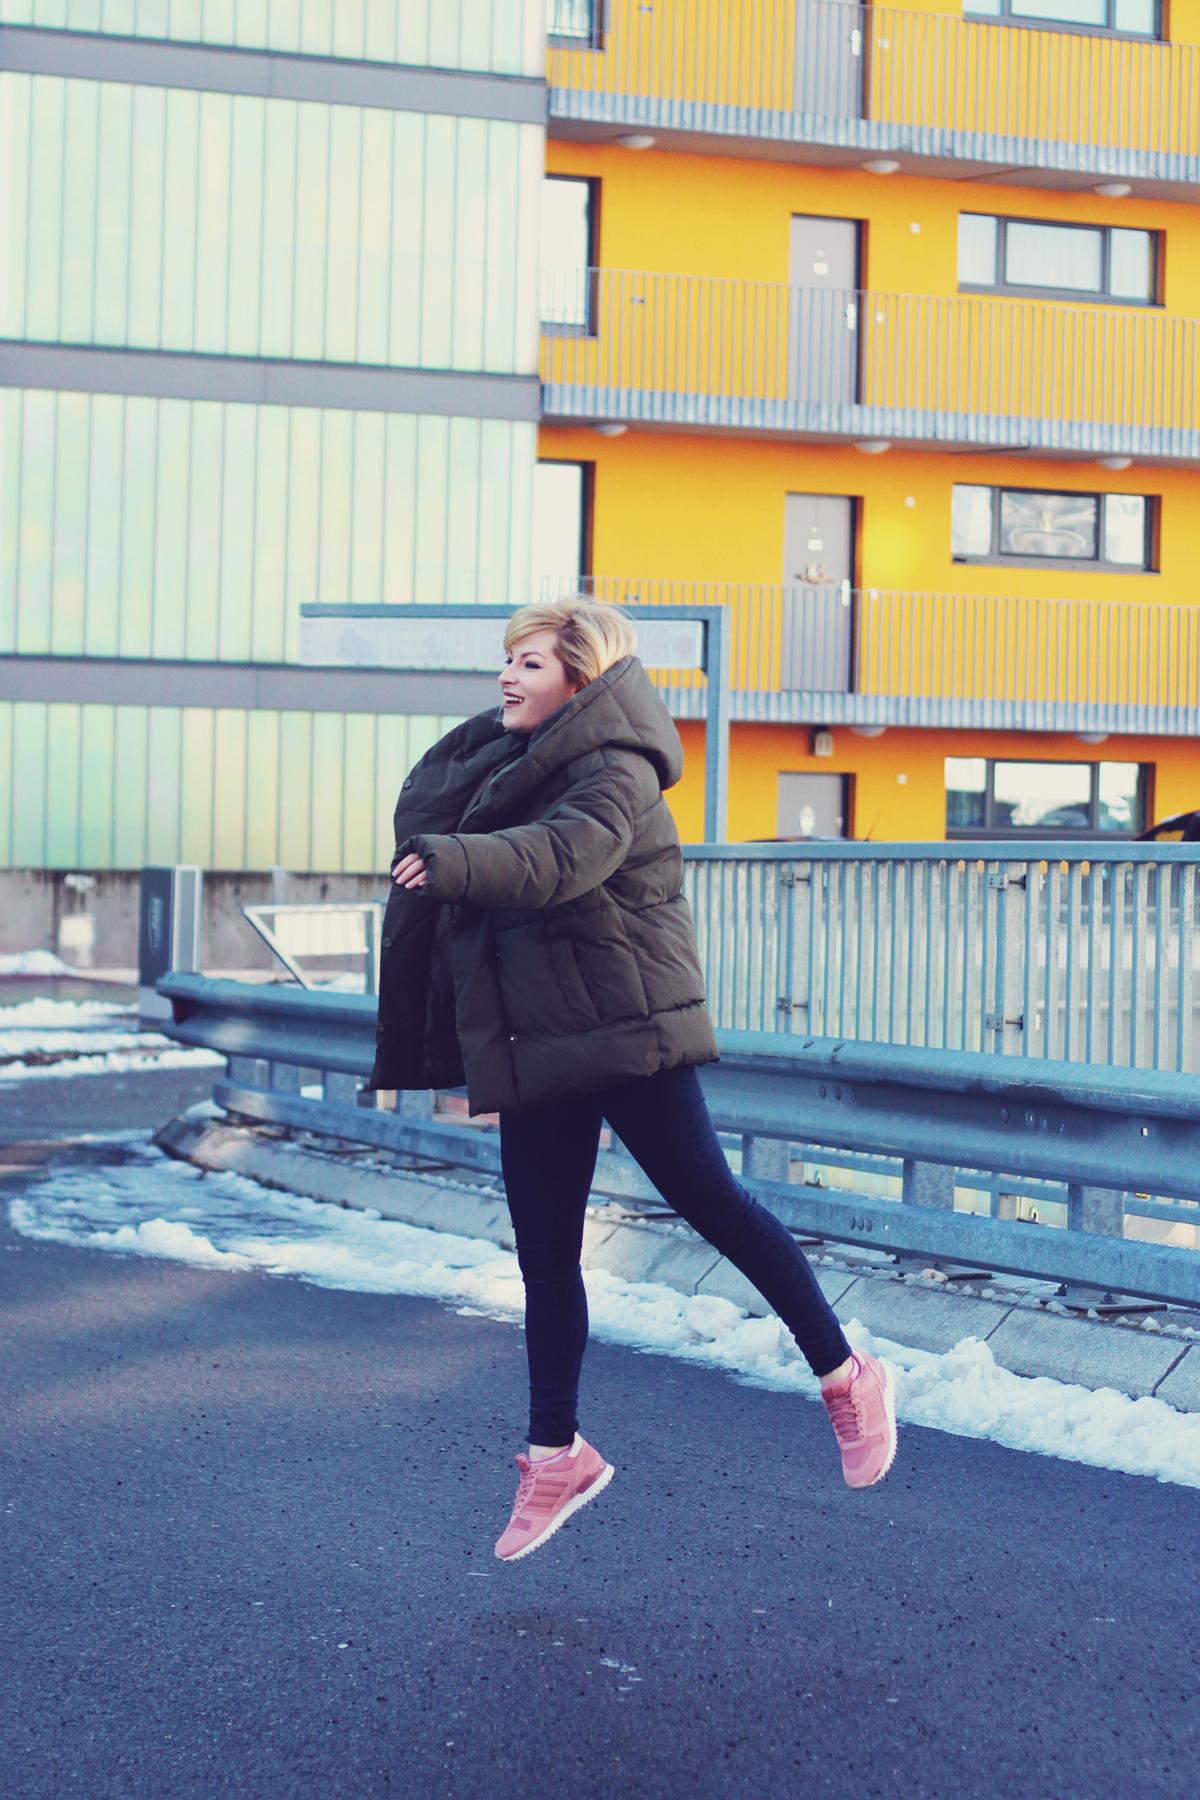 winter fashion, padded jacket, jeans, pink adidas originals, girl jumping, urban landscape, Vienna, snow